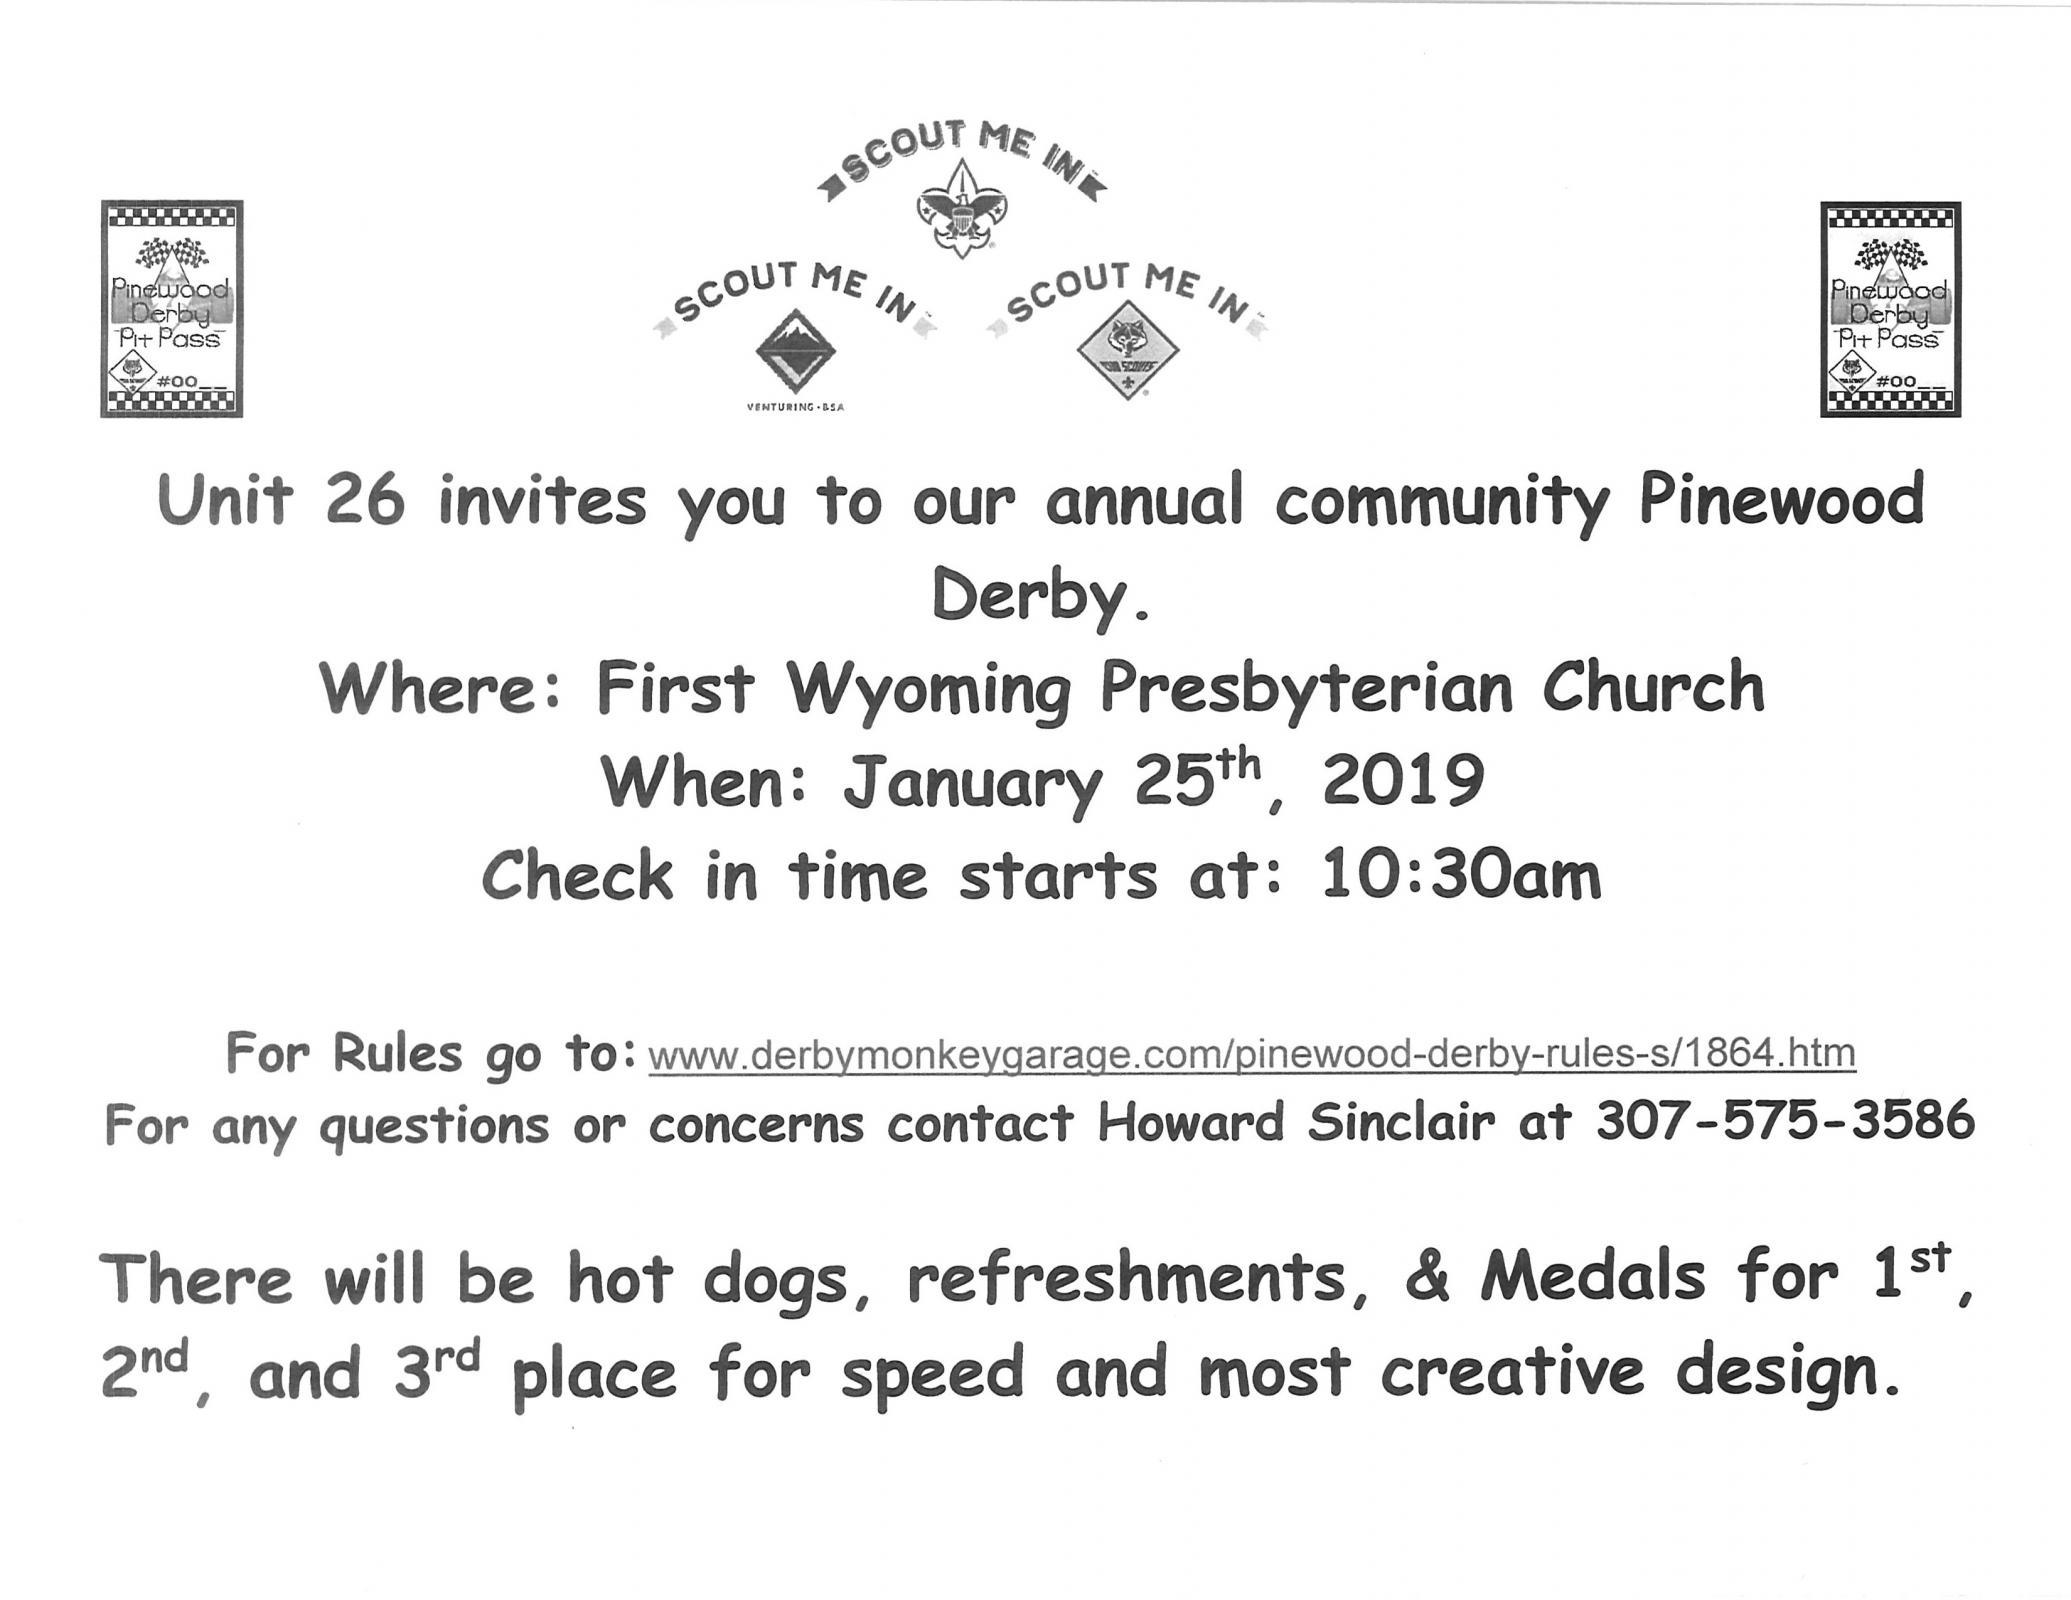 Community Pinewood Derby Photo